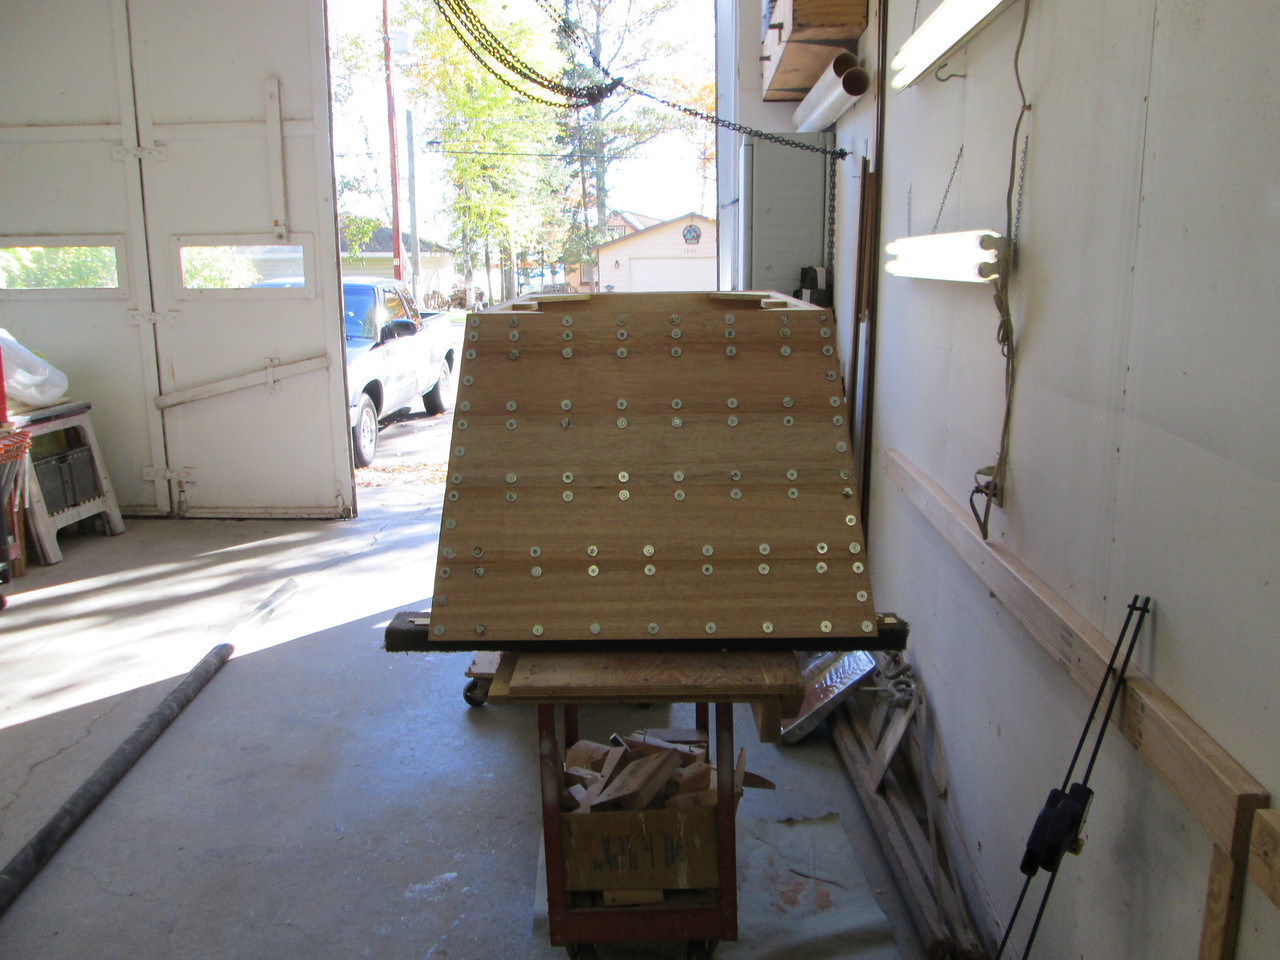 Rear of engine box with Mahogany planks installed.